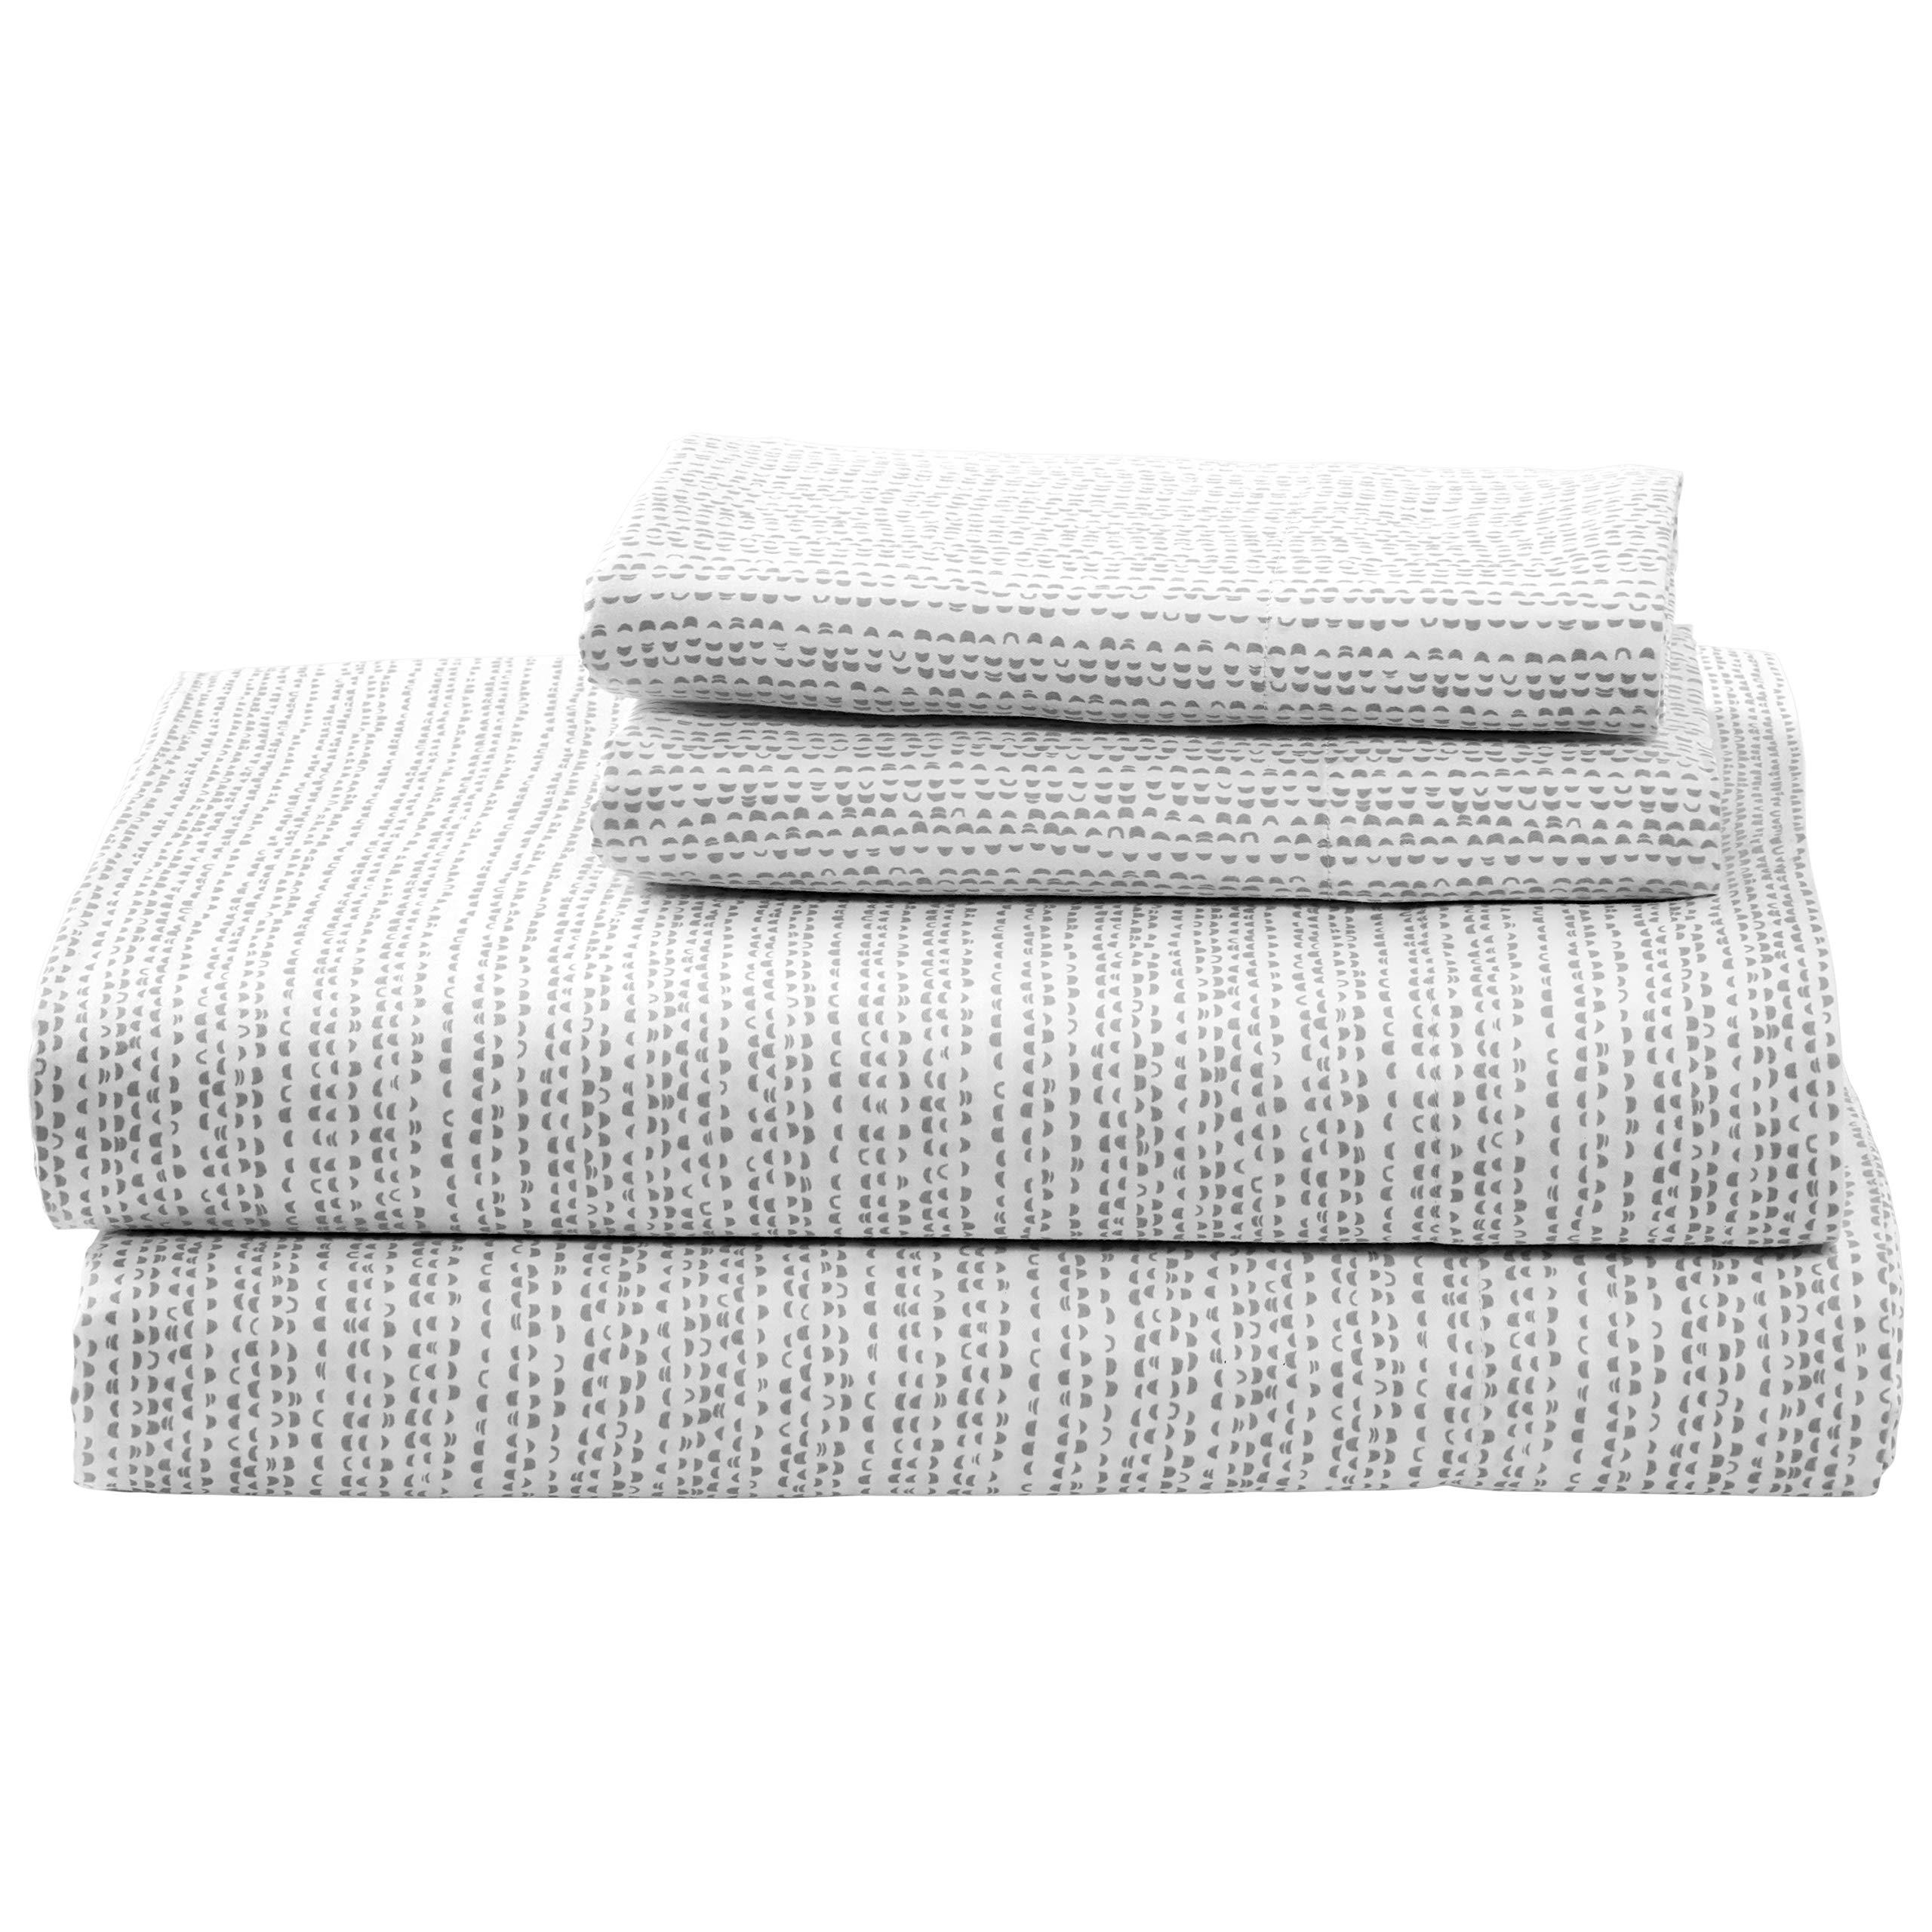 Rivet Half Moon Sateen 100% Cotton Bed Sheet Set, King, Pewter